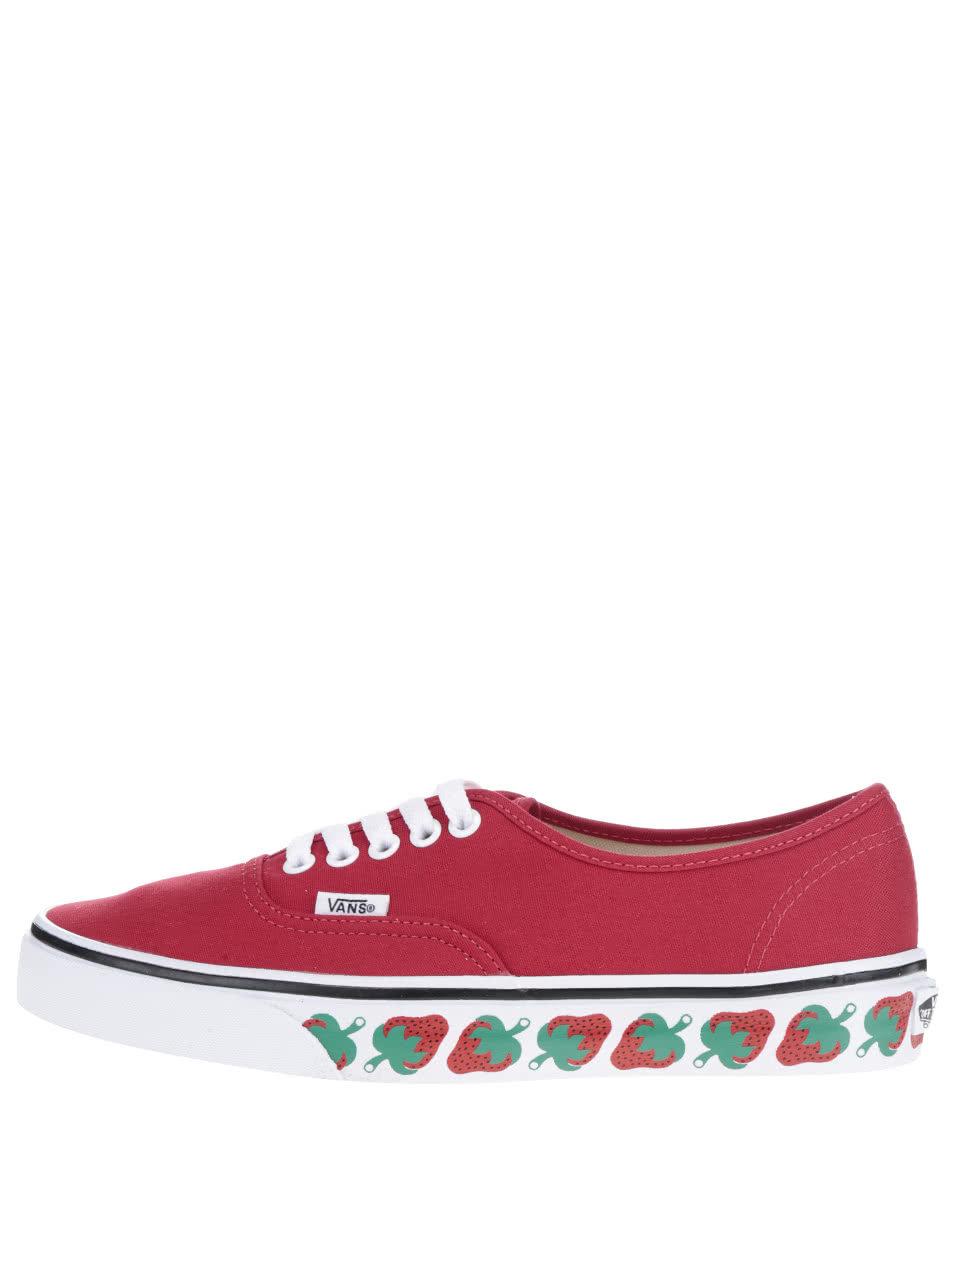 Červené dámske tenisky s motívom jahôd VANS Authentic ... 96d14ca113